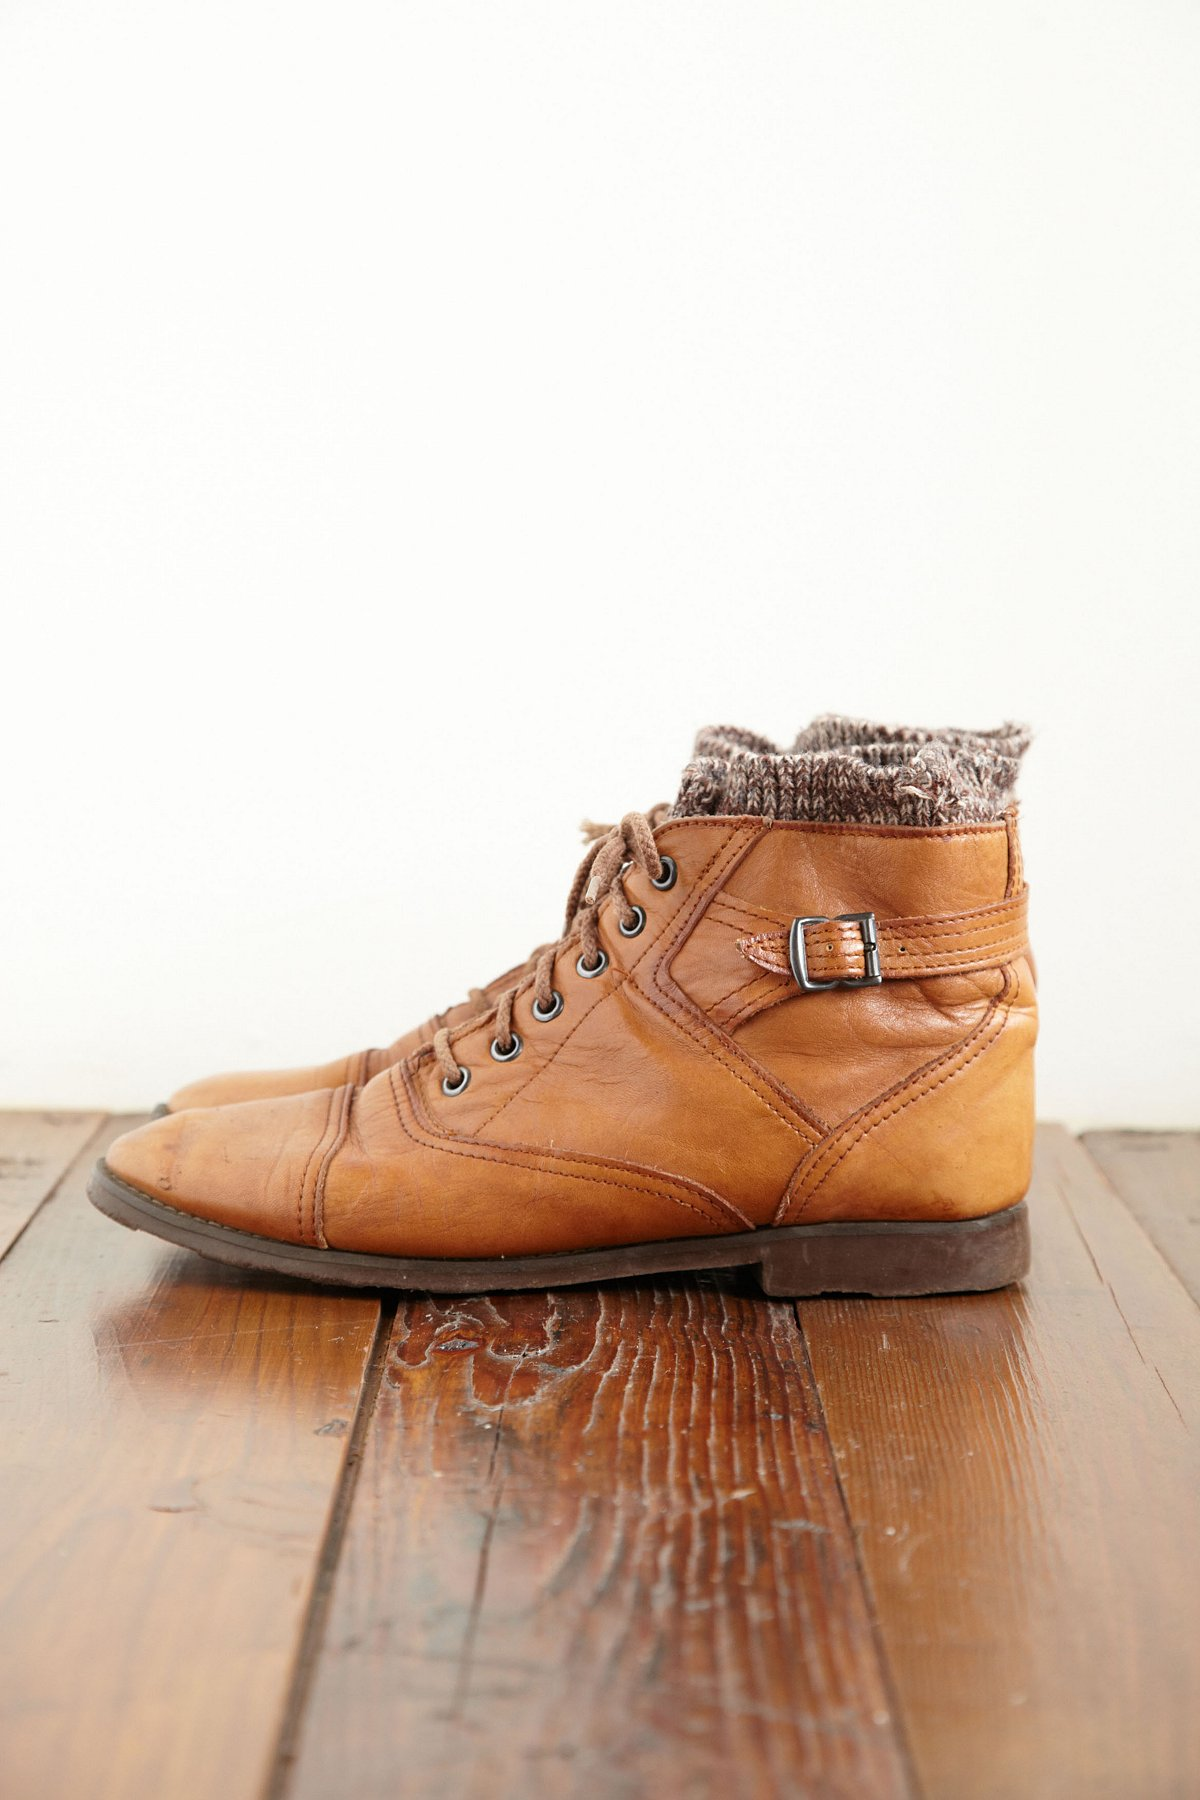 Vintage Knit Ankle Boots